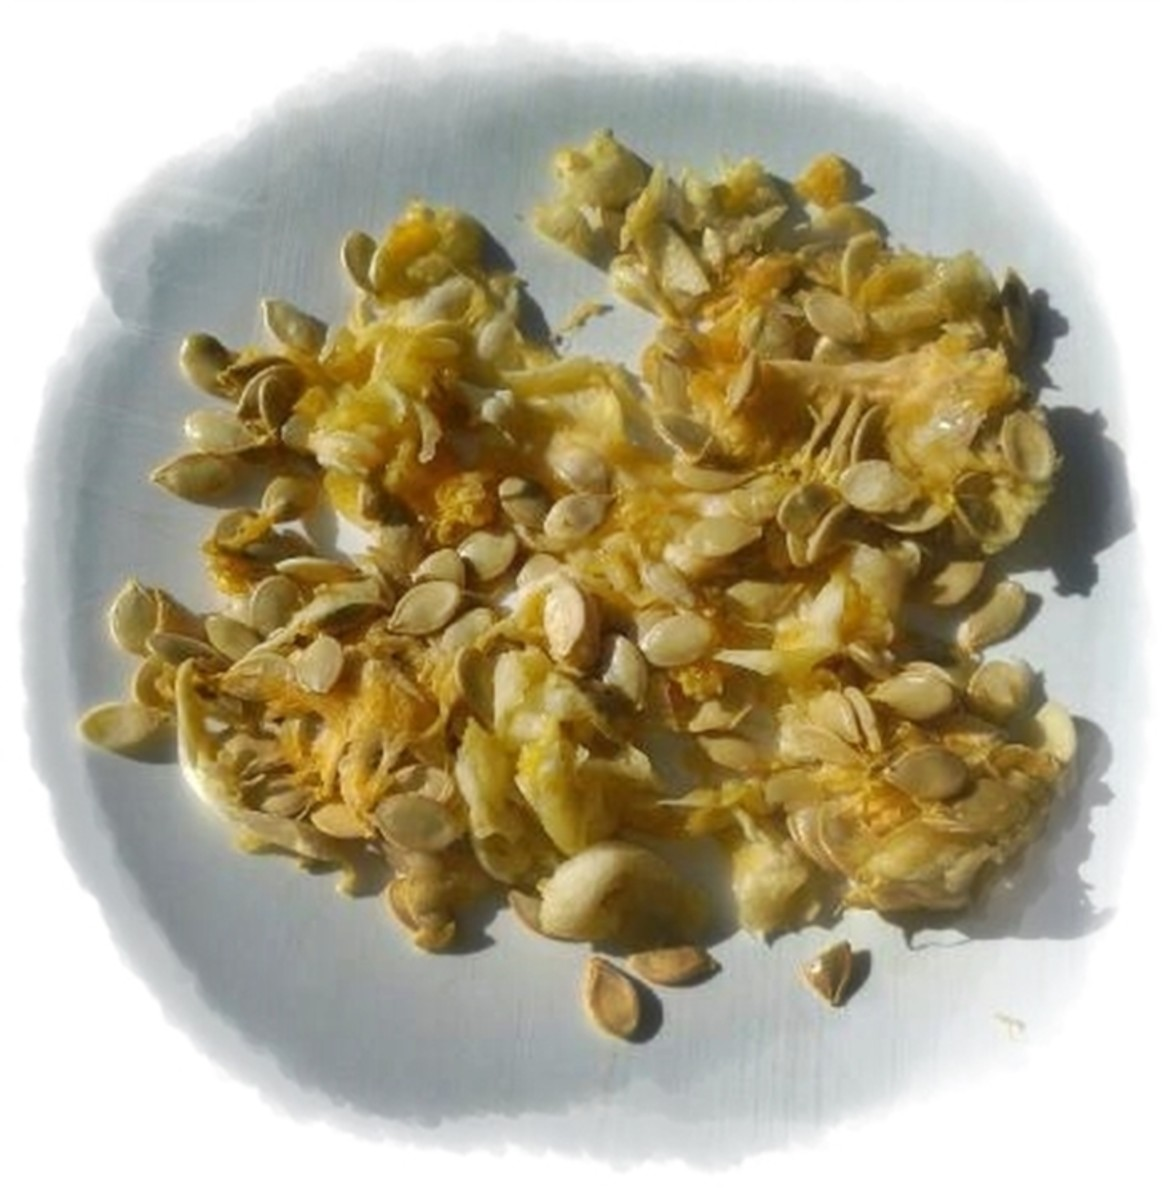 How to Roast Pumpkin Seeds (Plus Health Benefits)